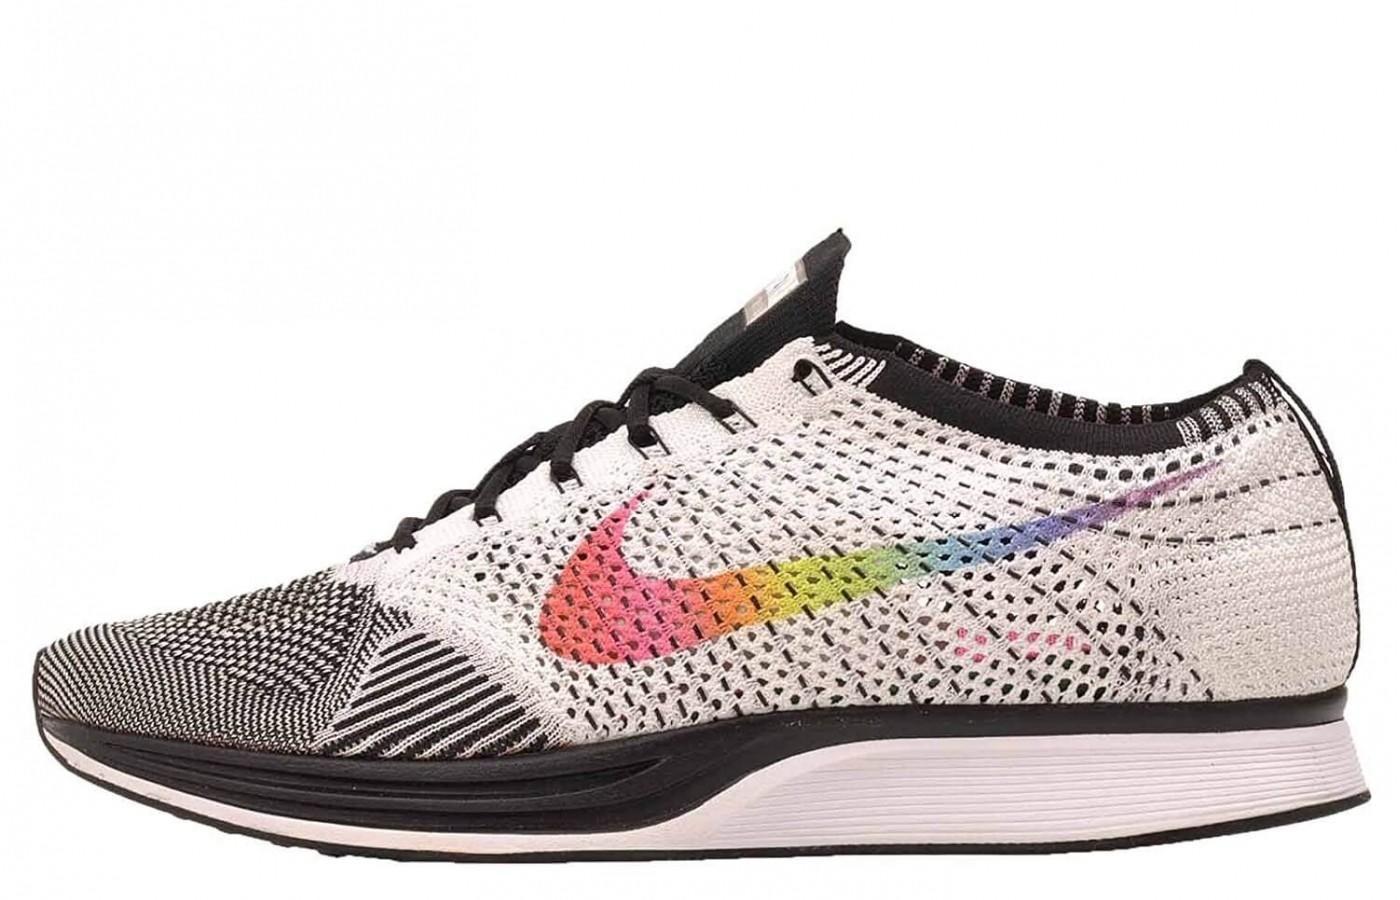 Nike Flyknit Racer Betrue Pink Nike Shoes White Nike Shoes Nike Shoes Flyknit